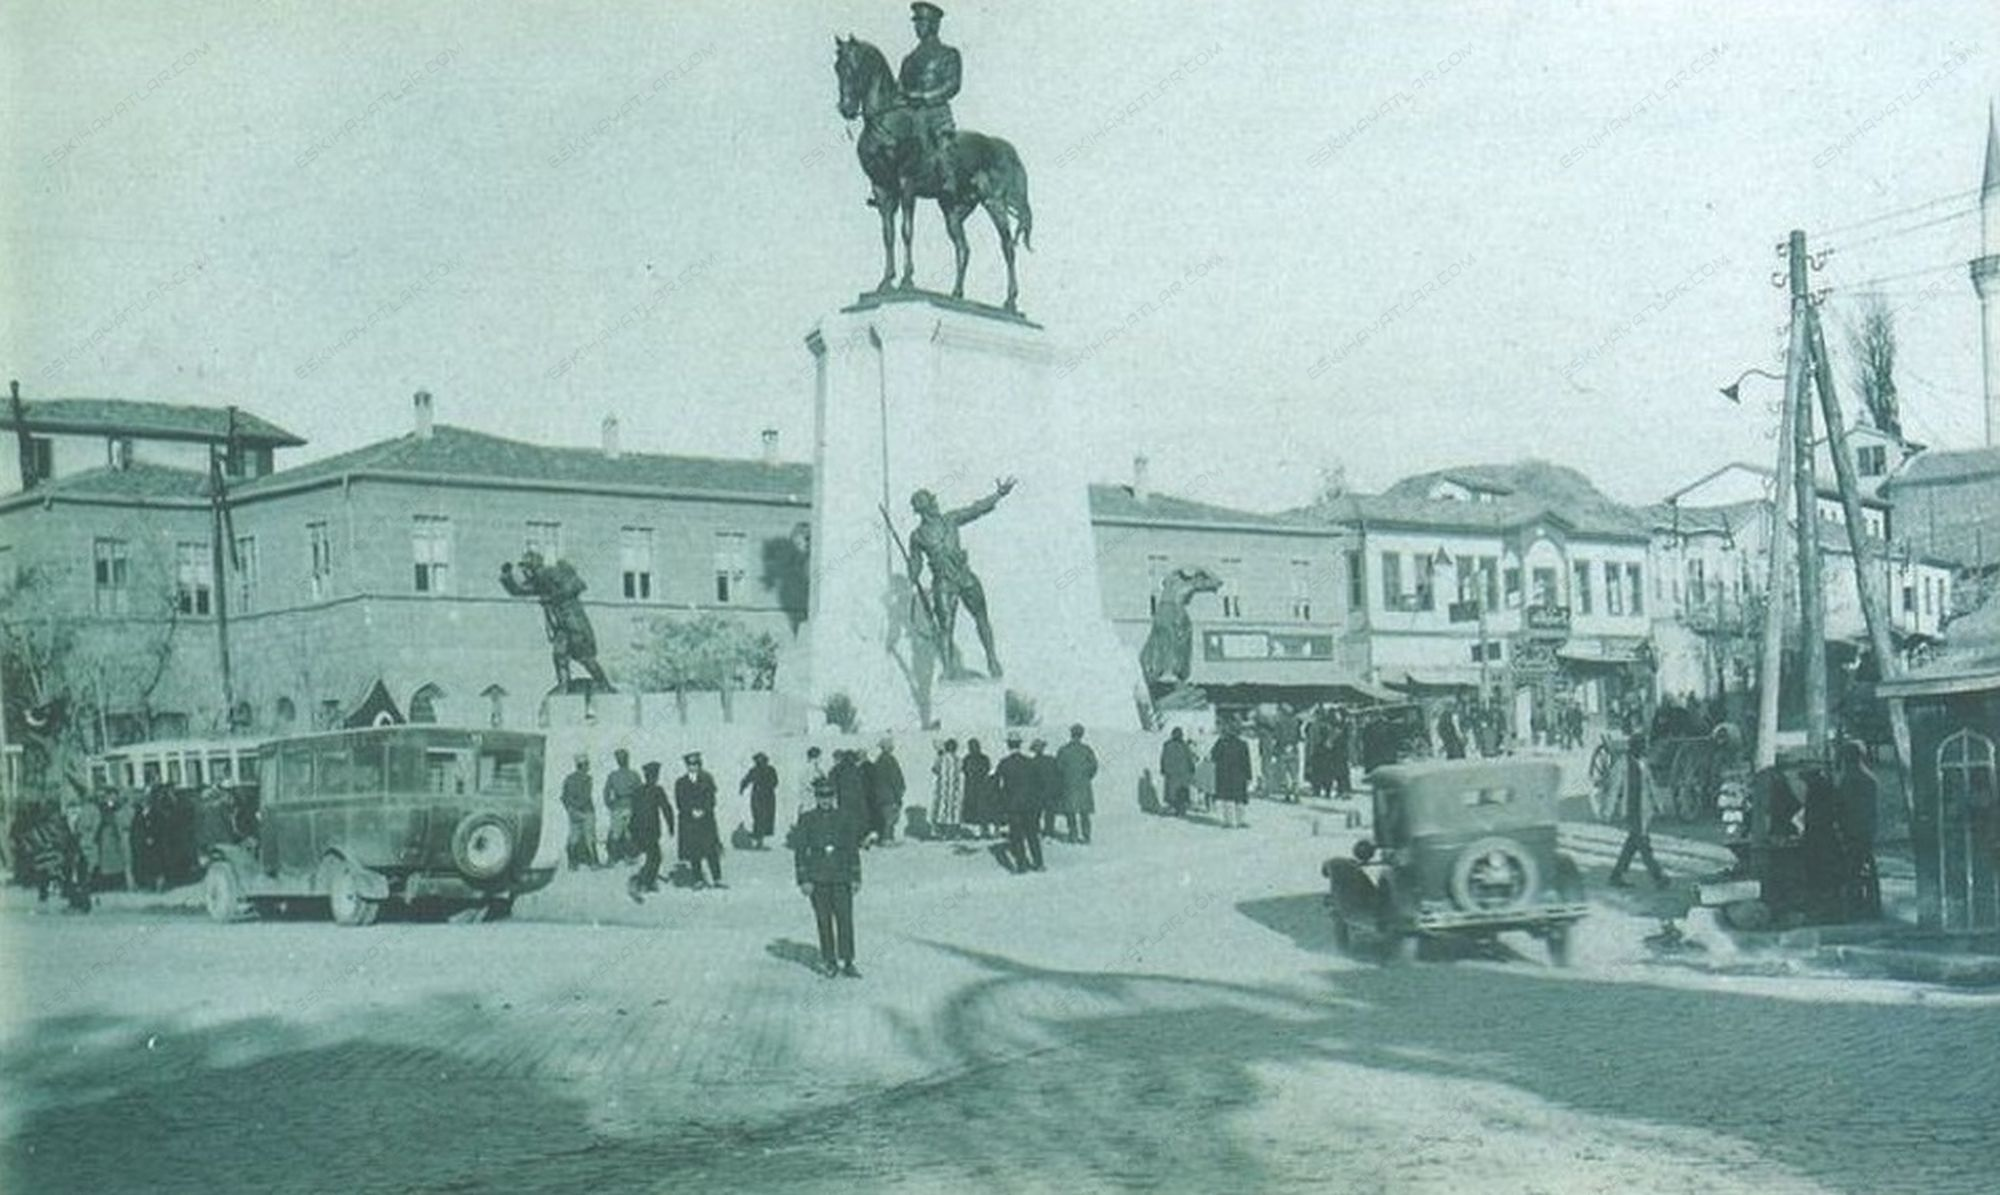 0293-cumhuriyet-doneminde-ankara-fotograflari-1997-tombak-dergisi-30-lu-yillarda-ankara-nasildi (10)